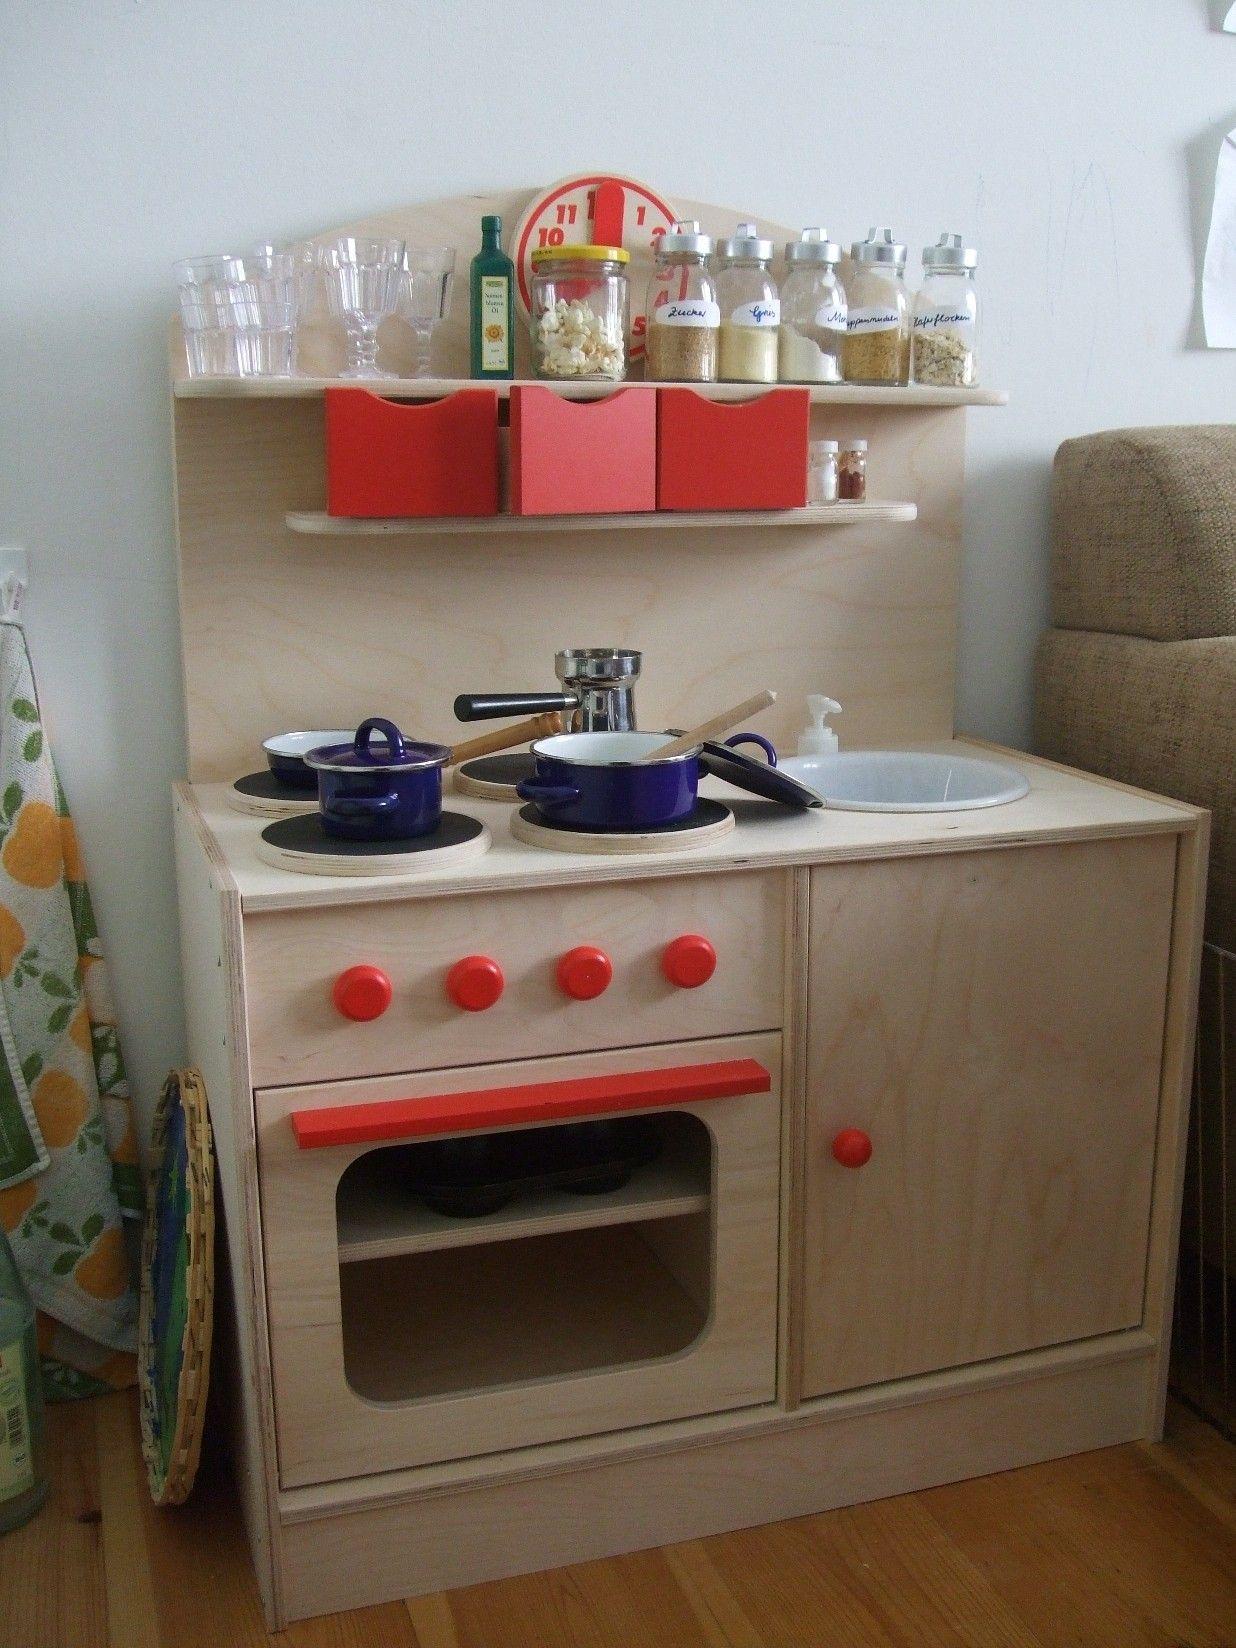 Kinderkuche Selber Bauen #75: Kinderküche